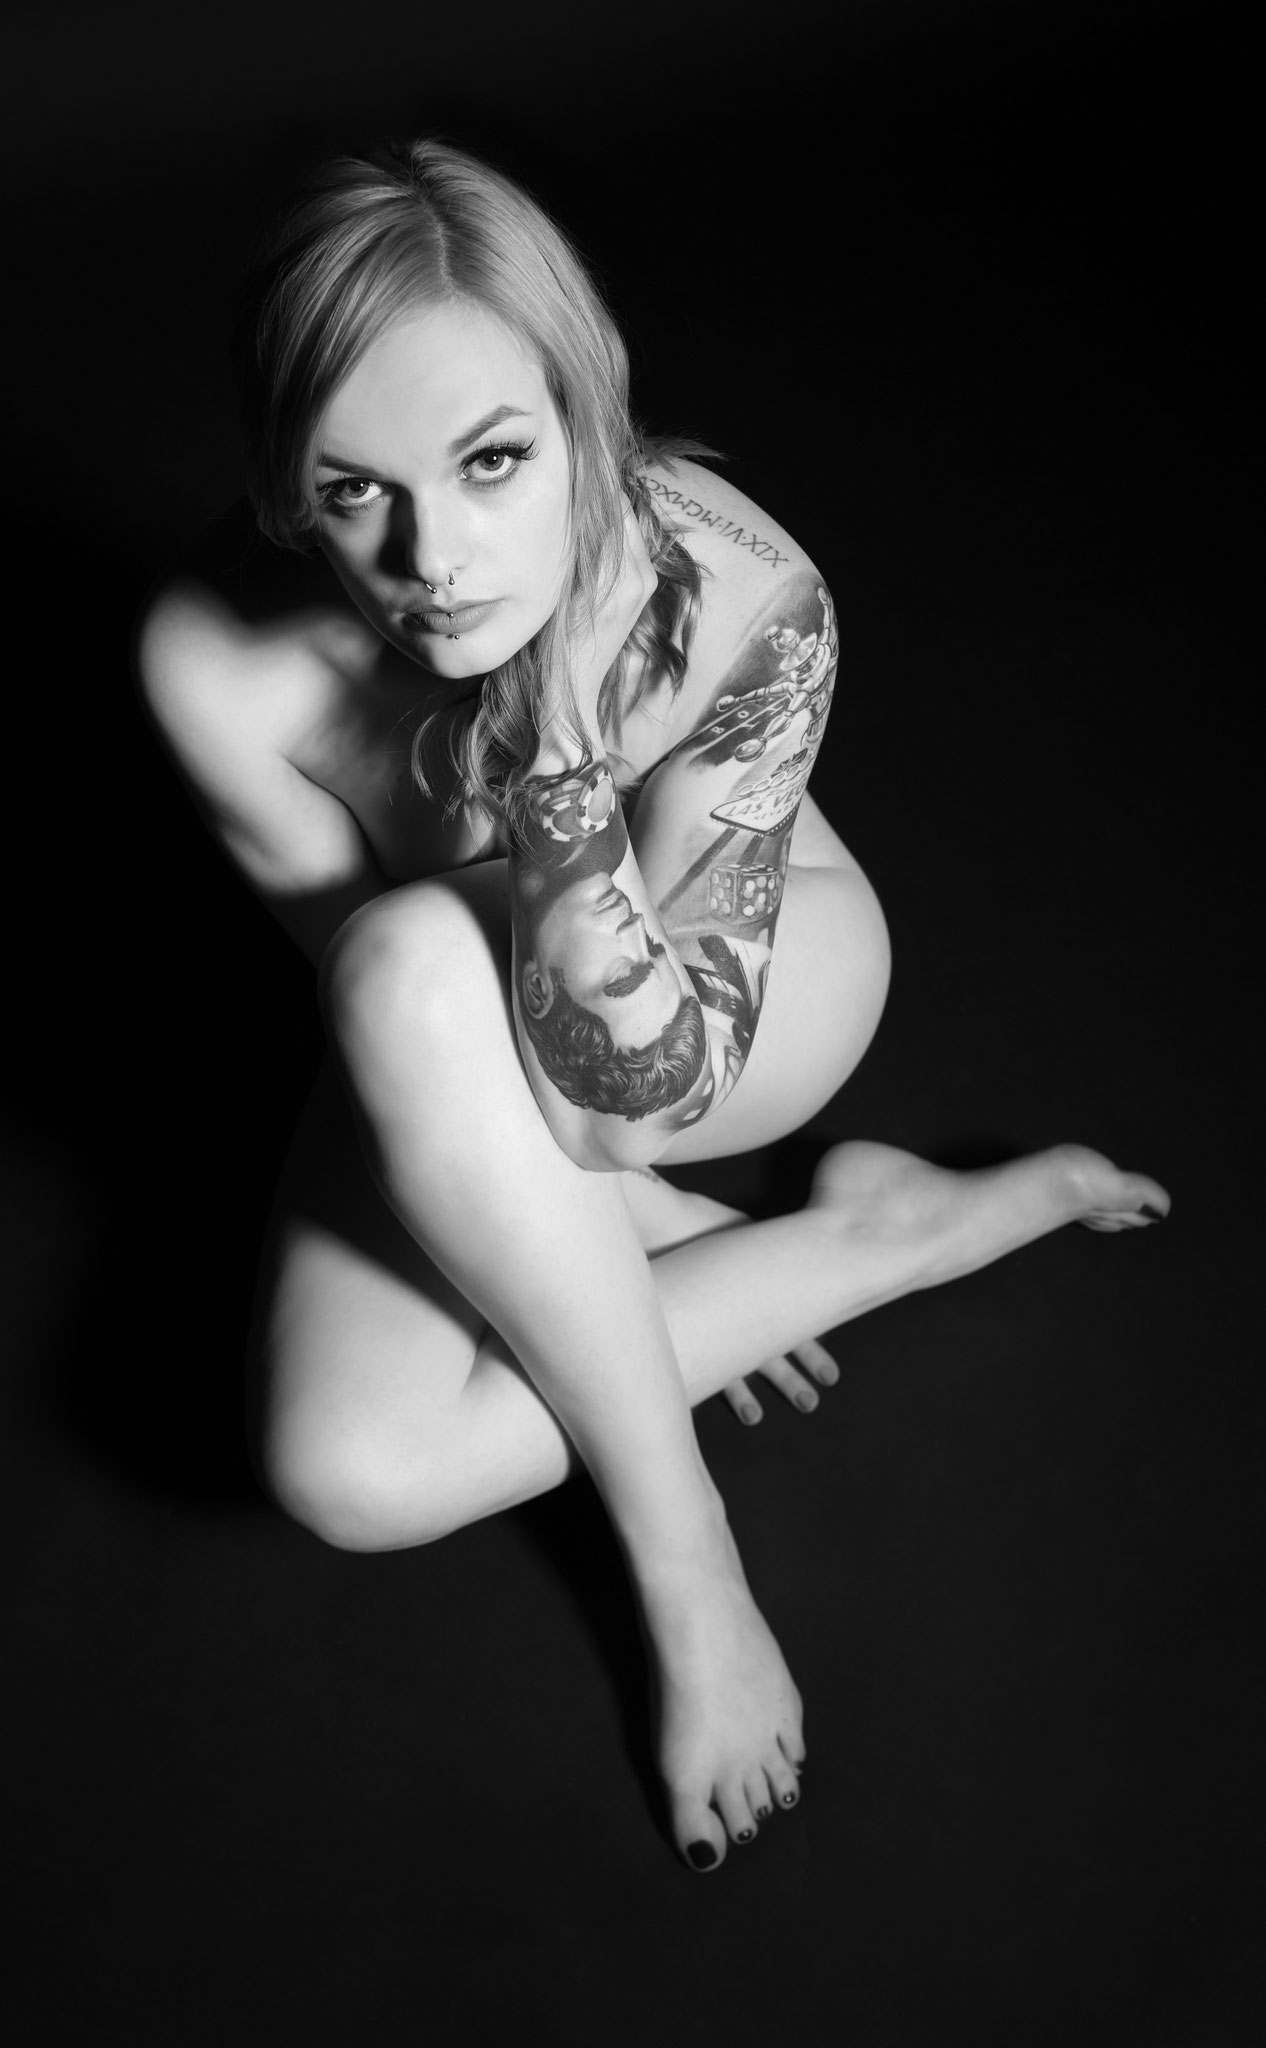 Sexy Pose beim Aktshooting im Fotostudio für Aktphotographie - nude art shooting